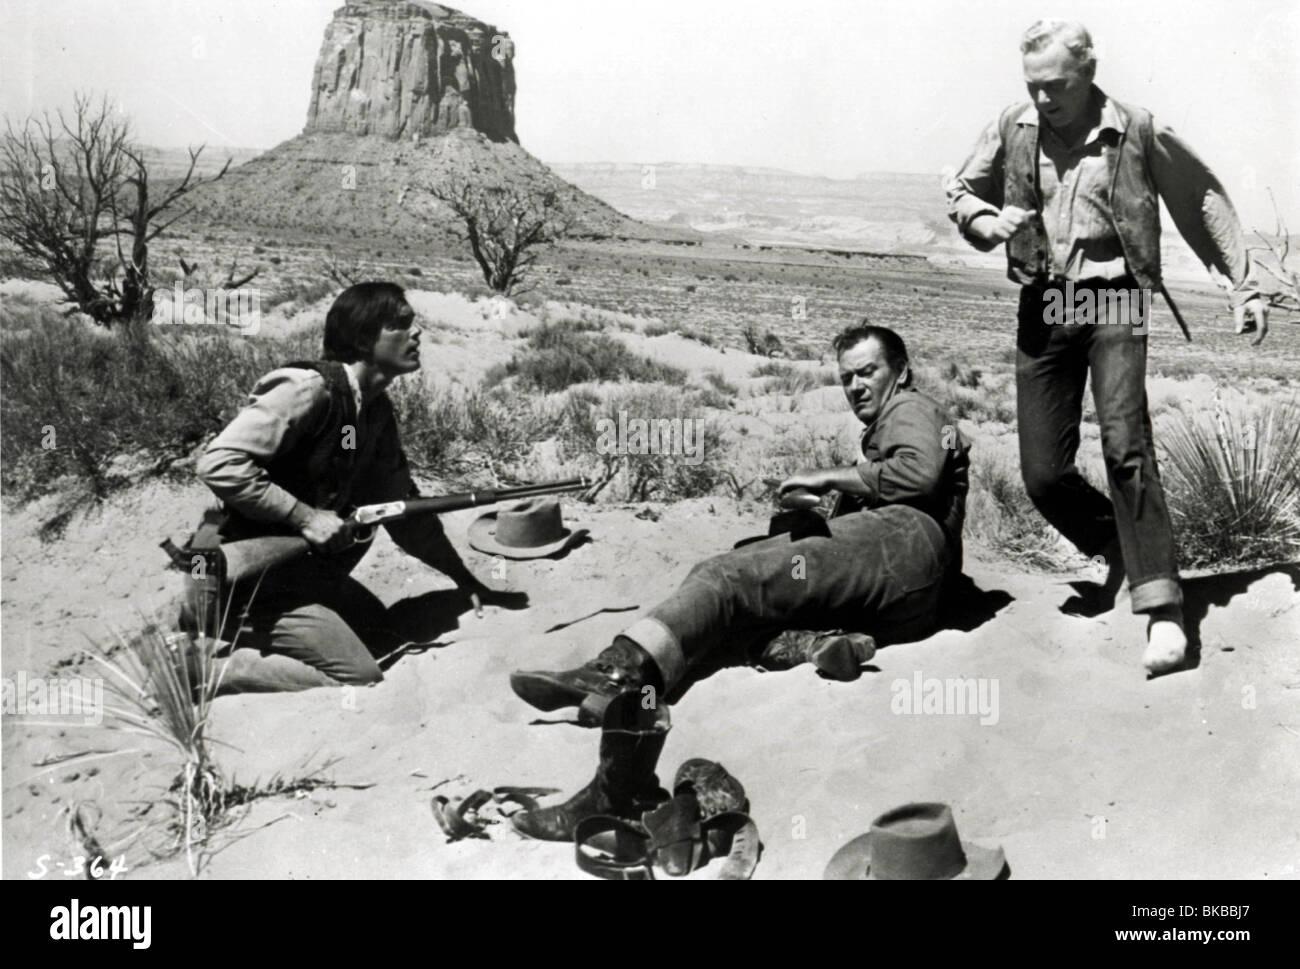 THE SEARCHERS -1956 JOHN WAYNE - Stock Image